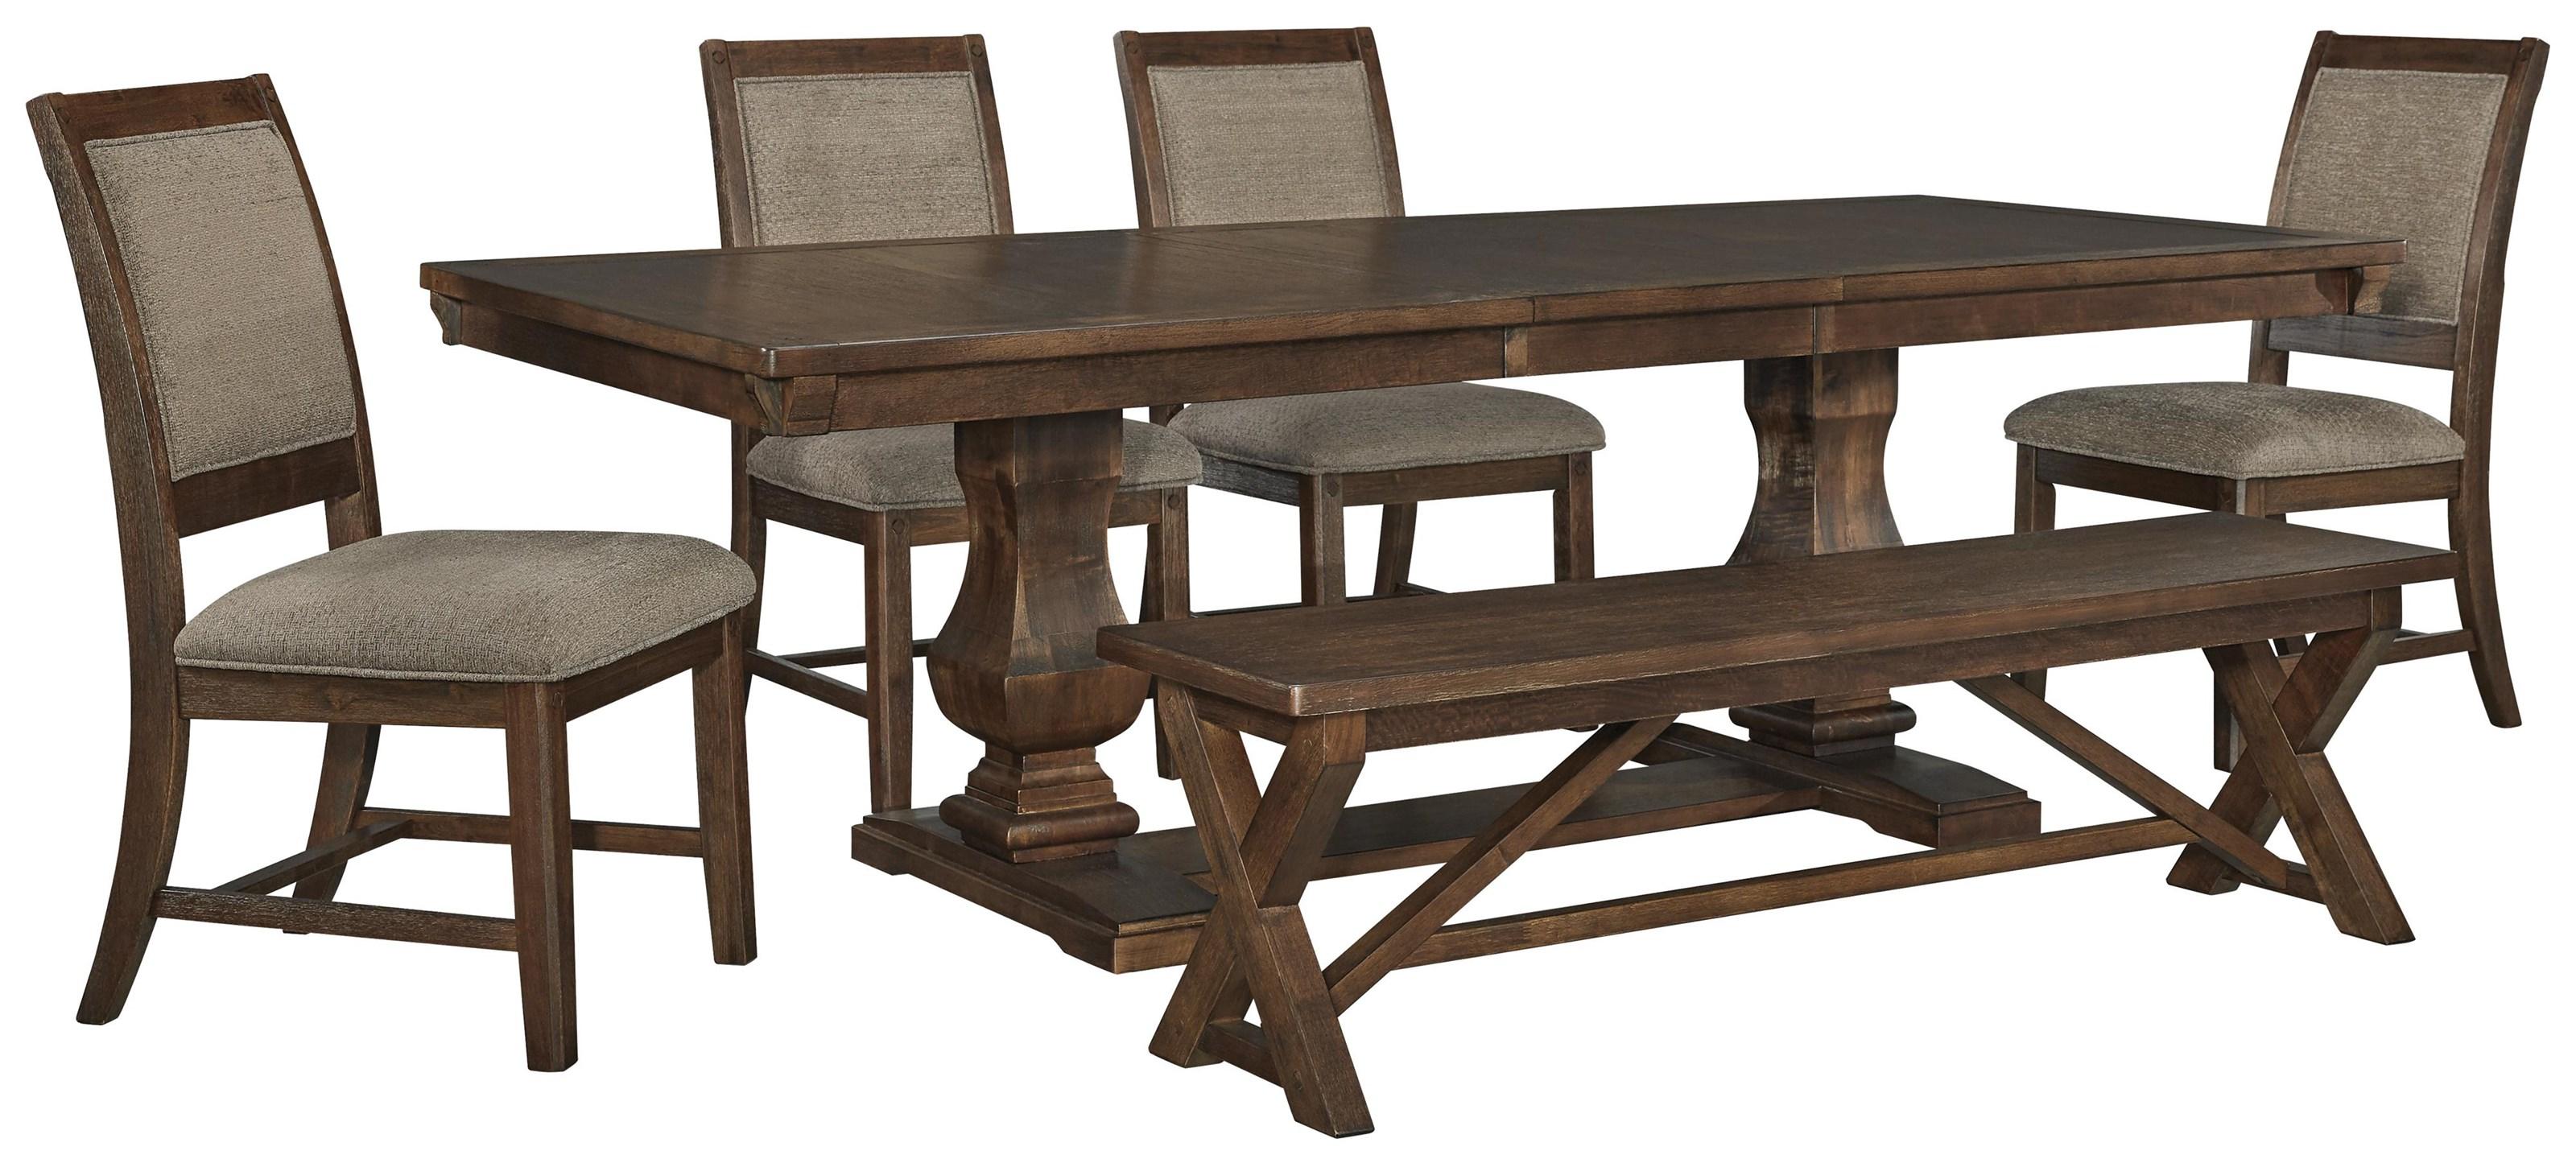 Windville 7 PC Dining Room Set by Millennium at Sam Levitz Furniture